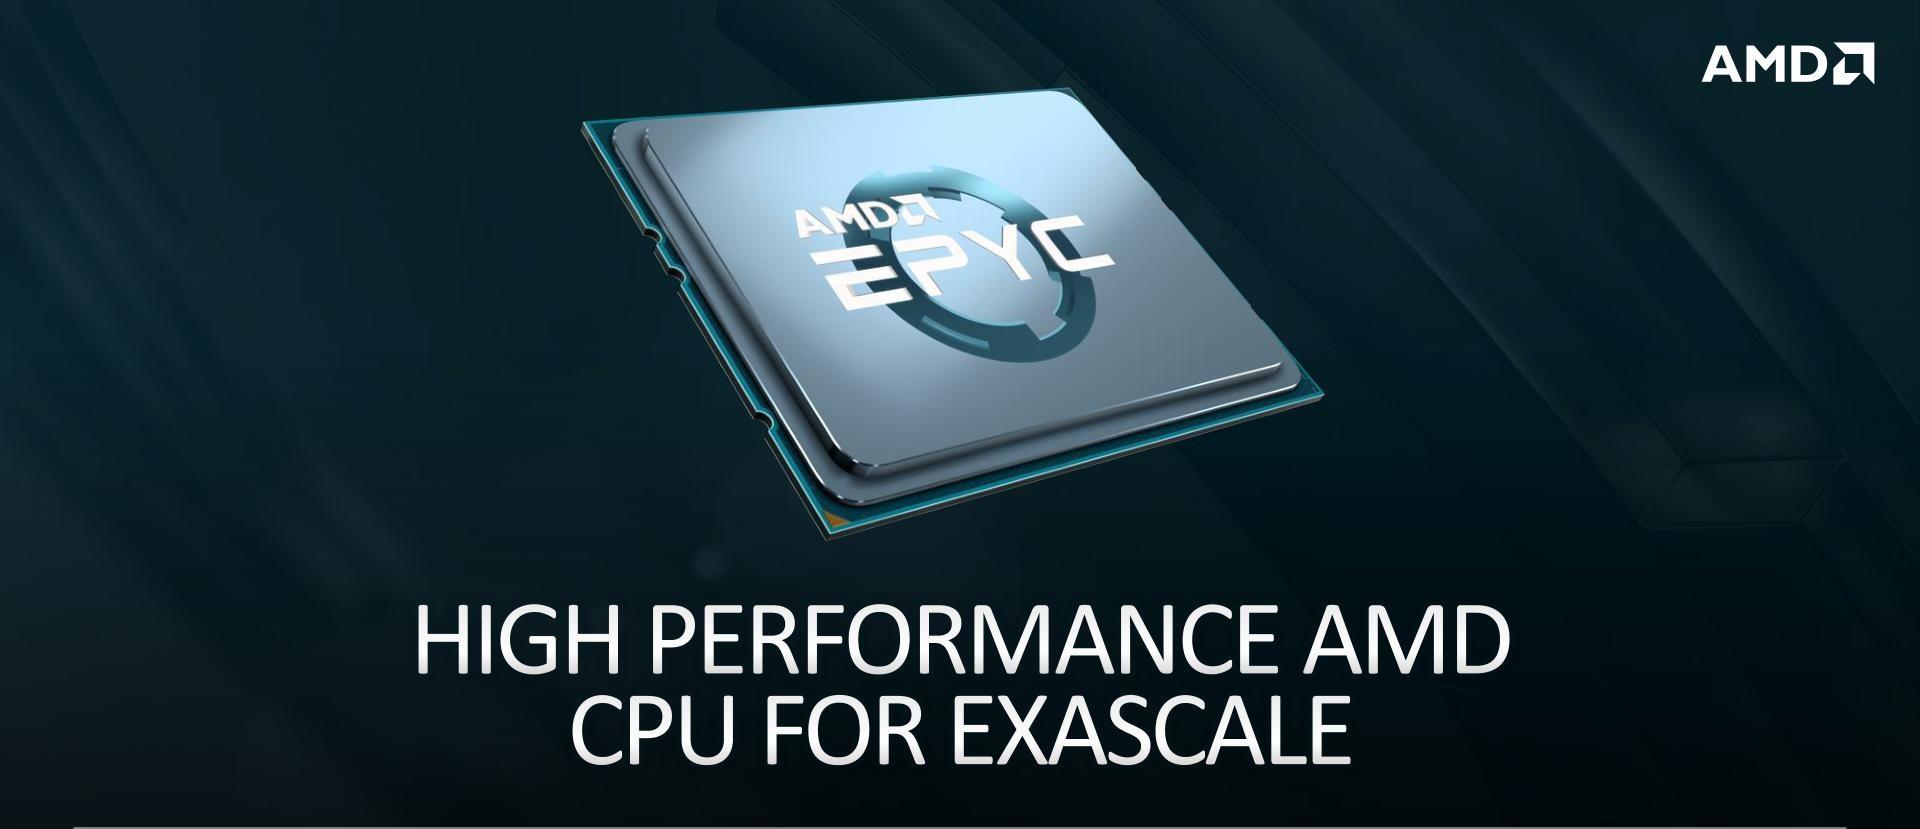 AMD 3rd Gen EPYC Milan 'EPYC 7543' CPU Dengan 32 Core & 3.7 GHz Boost Clocks Di Benchmark